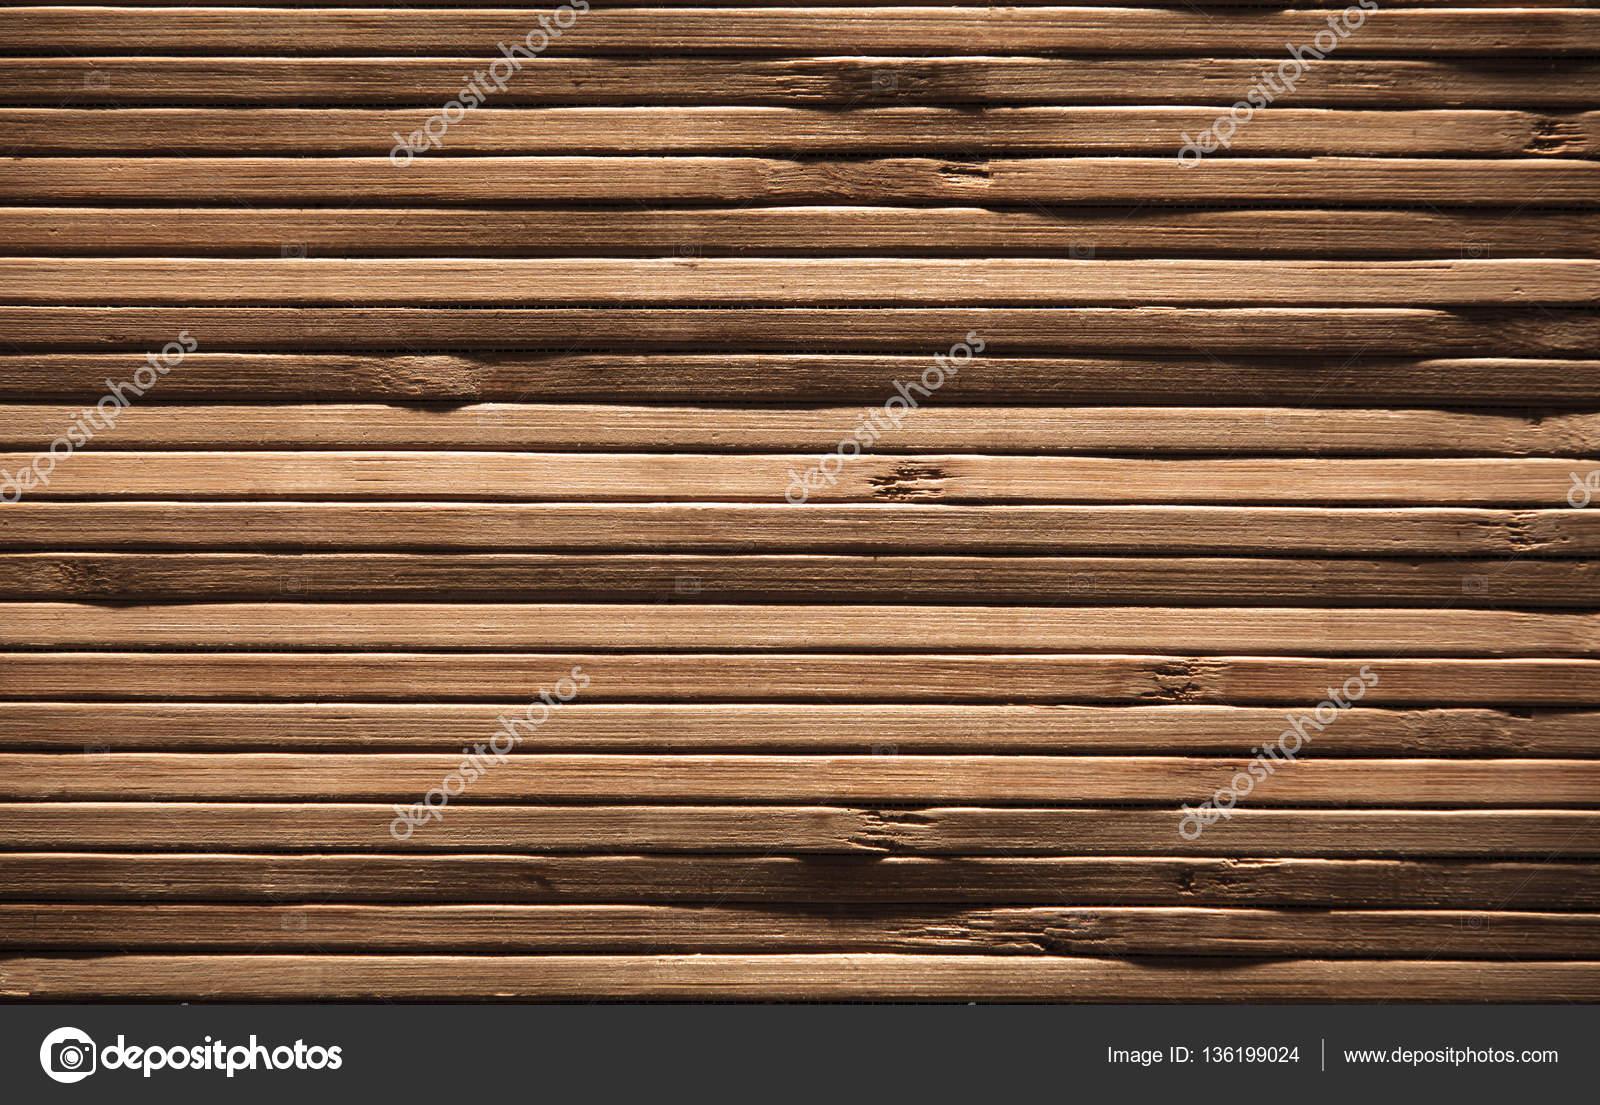 Hout planken achtergrond bruin houten patroon bamboe plank muur